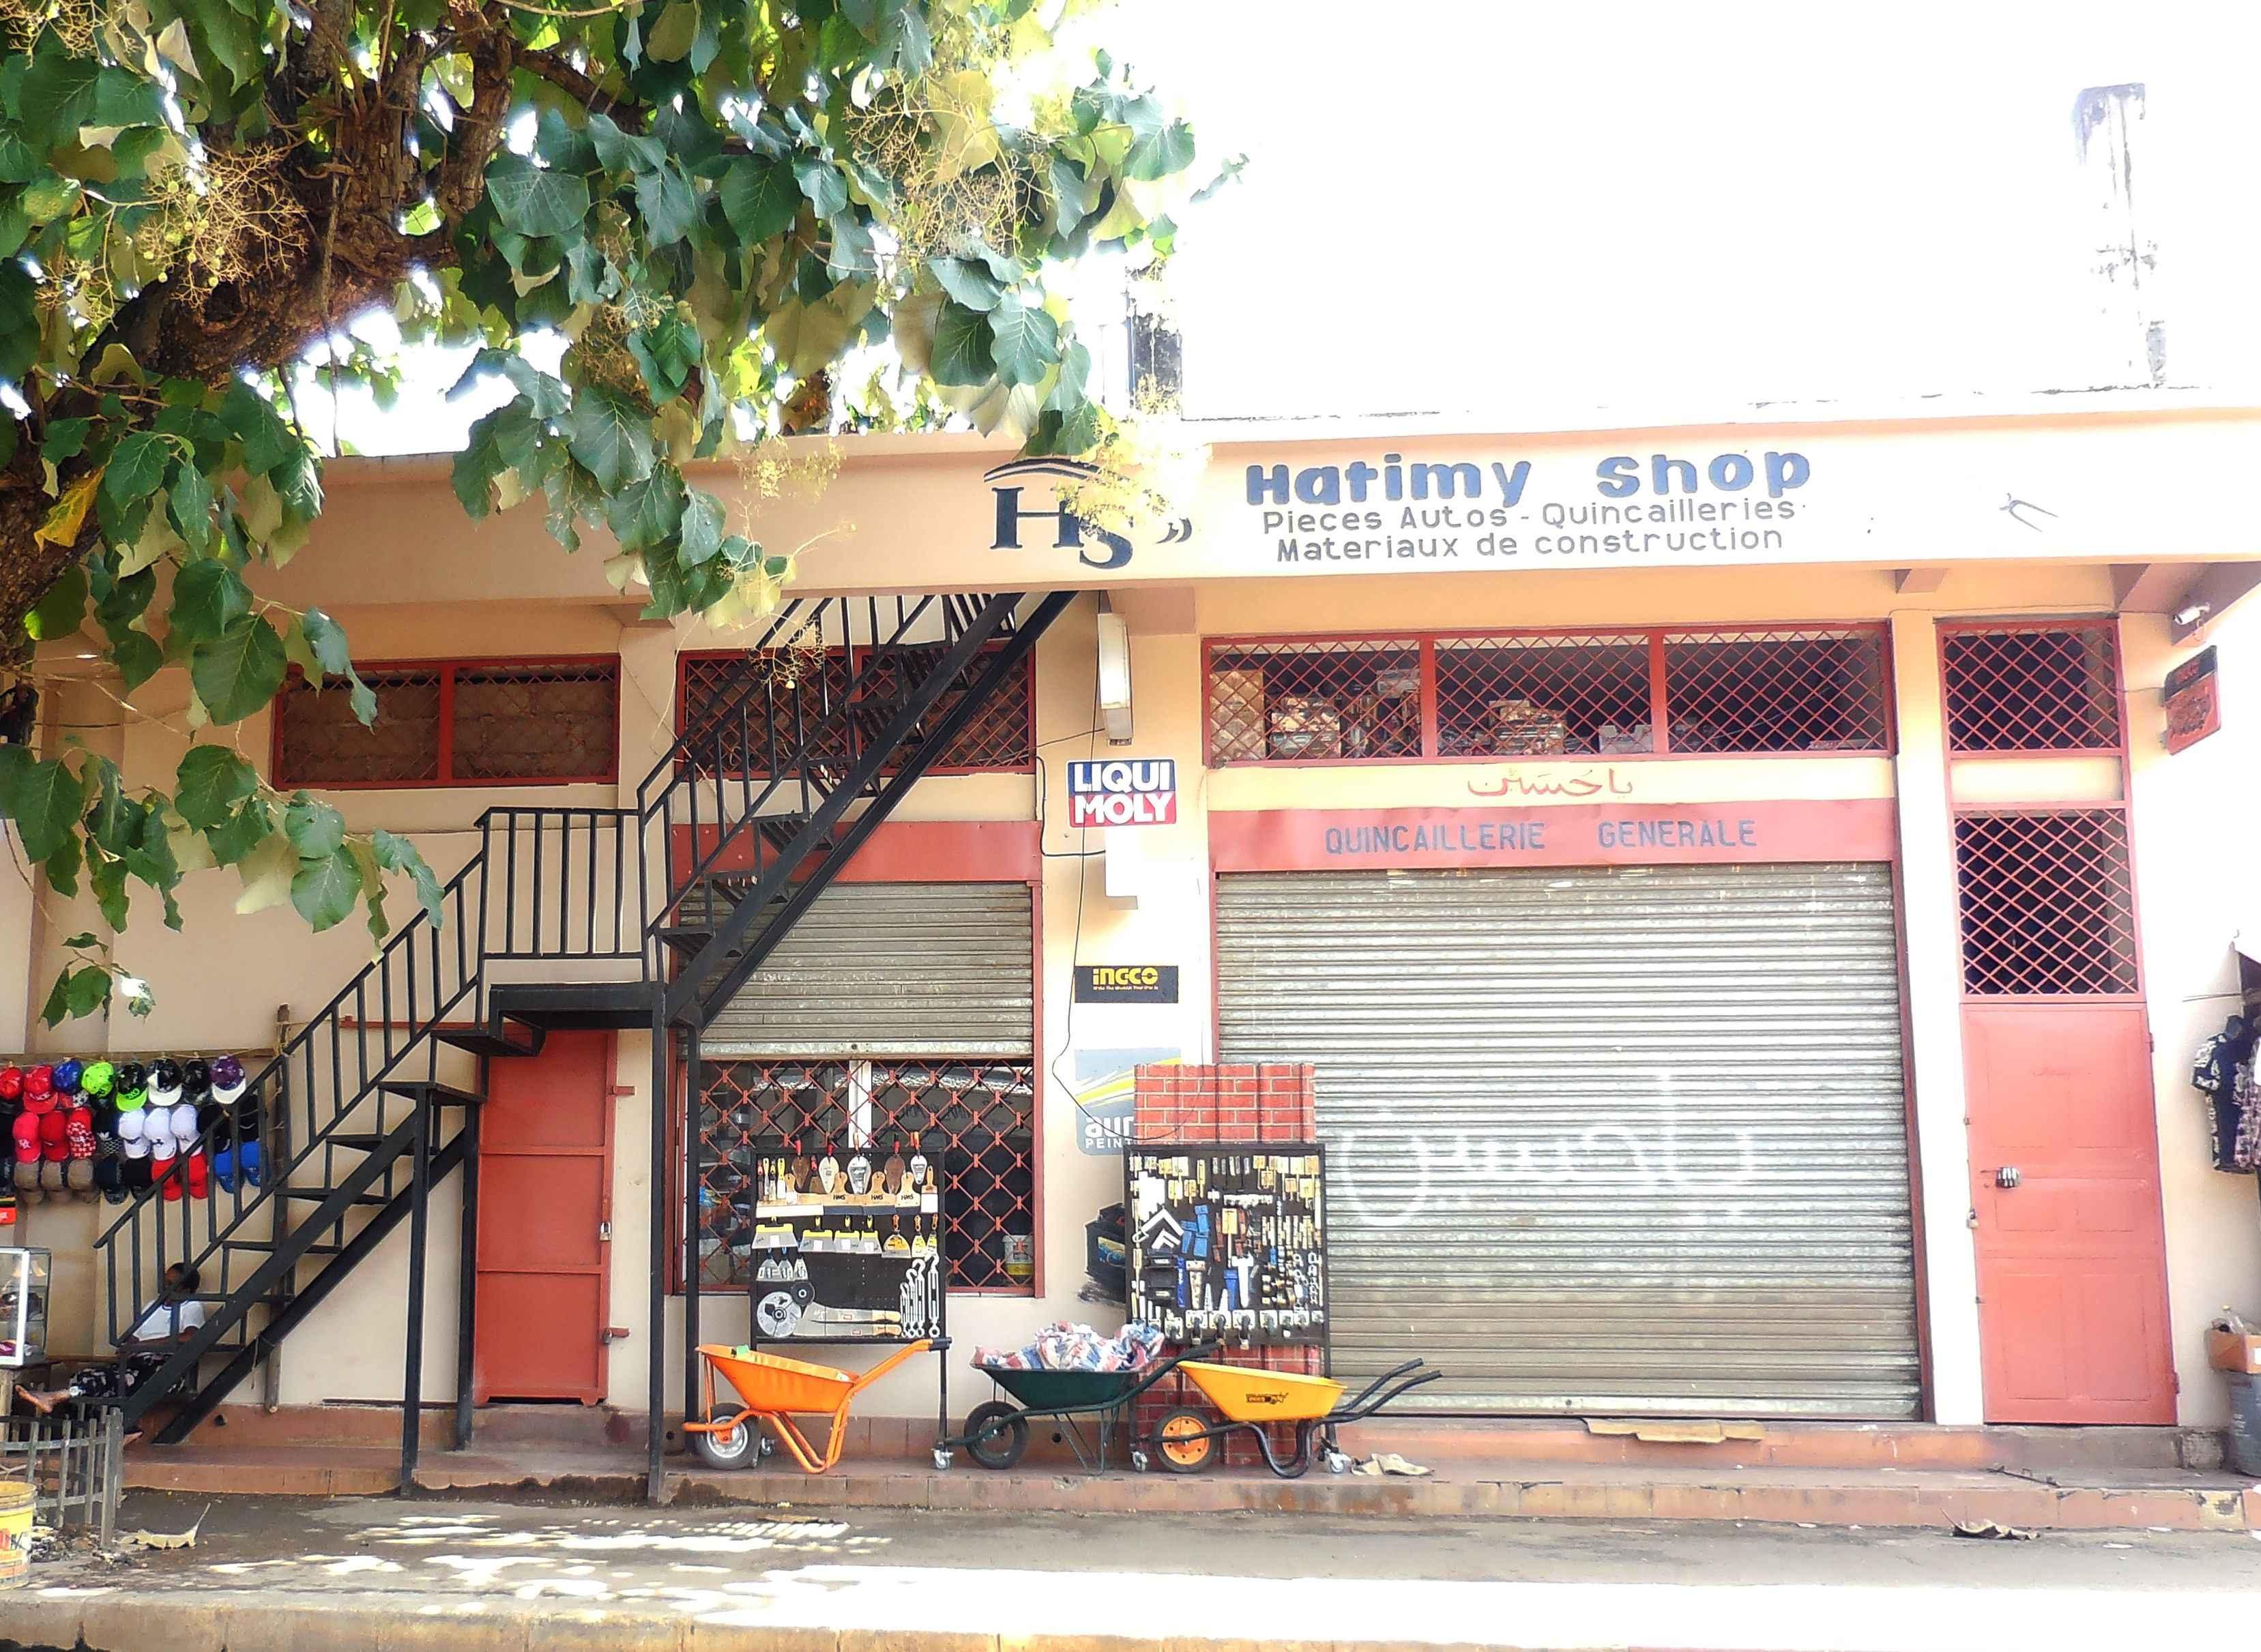 Hatimy Shop